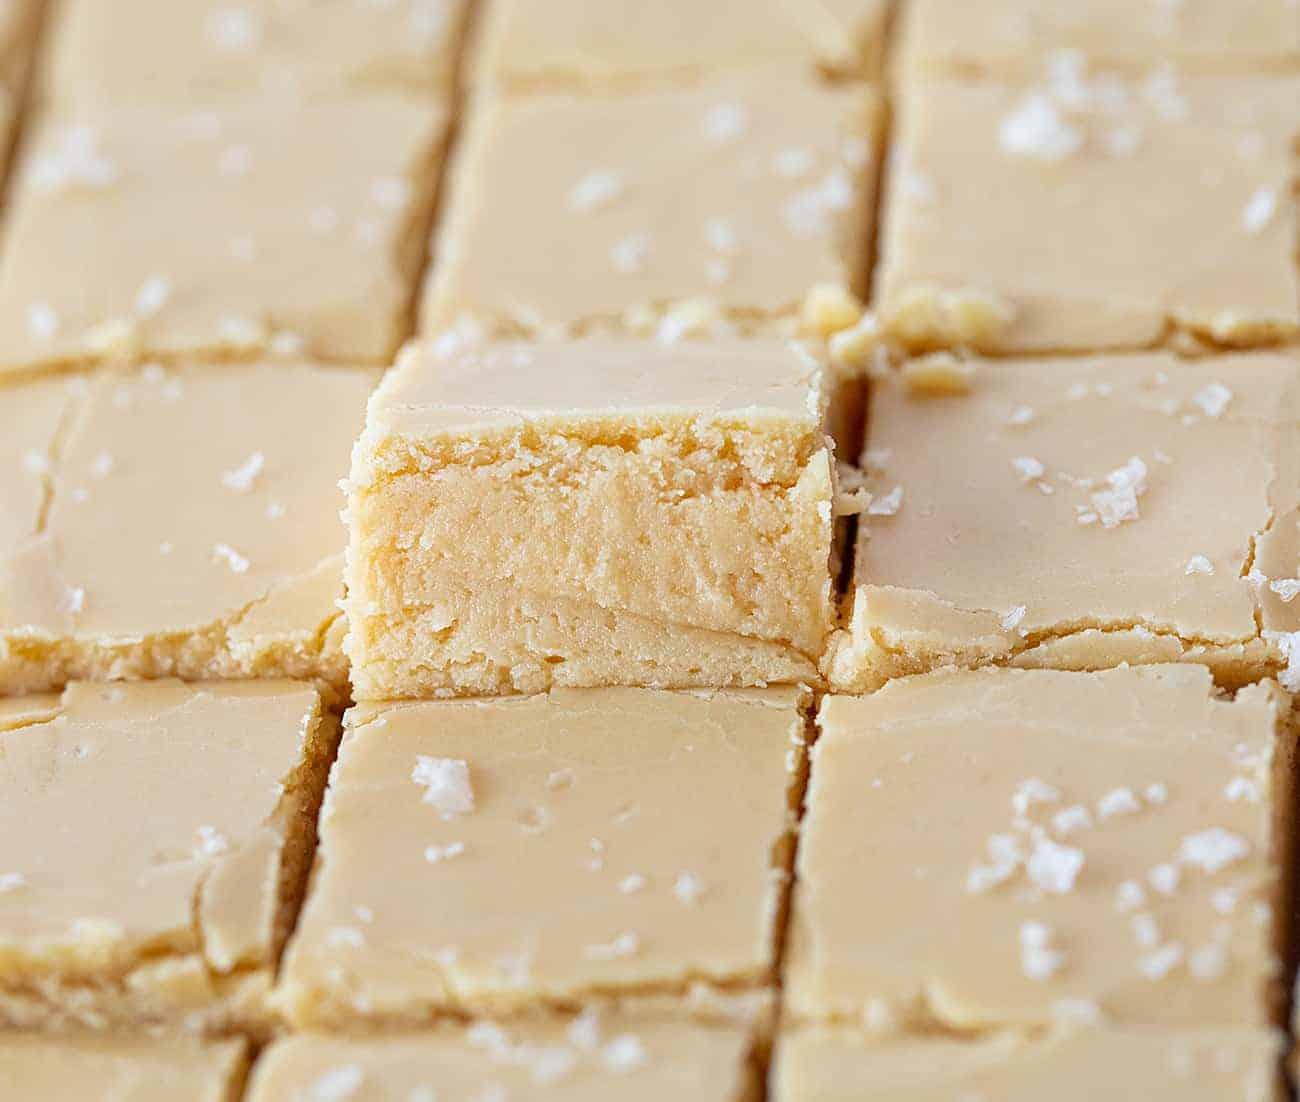 Pieces of salted caramel fudge cut